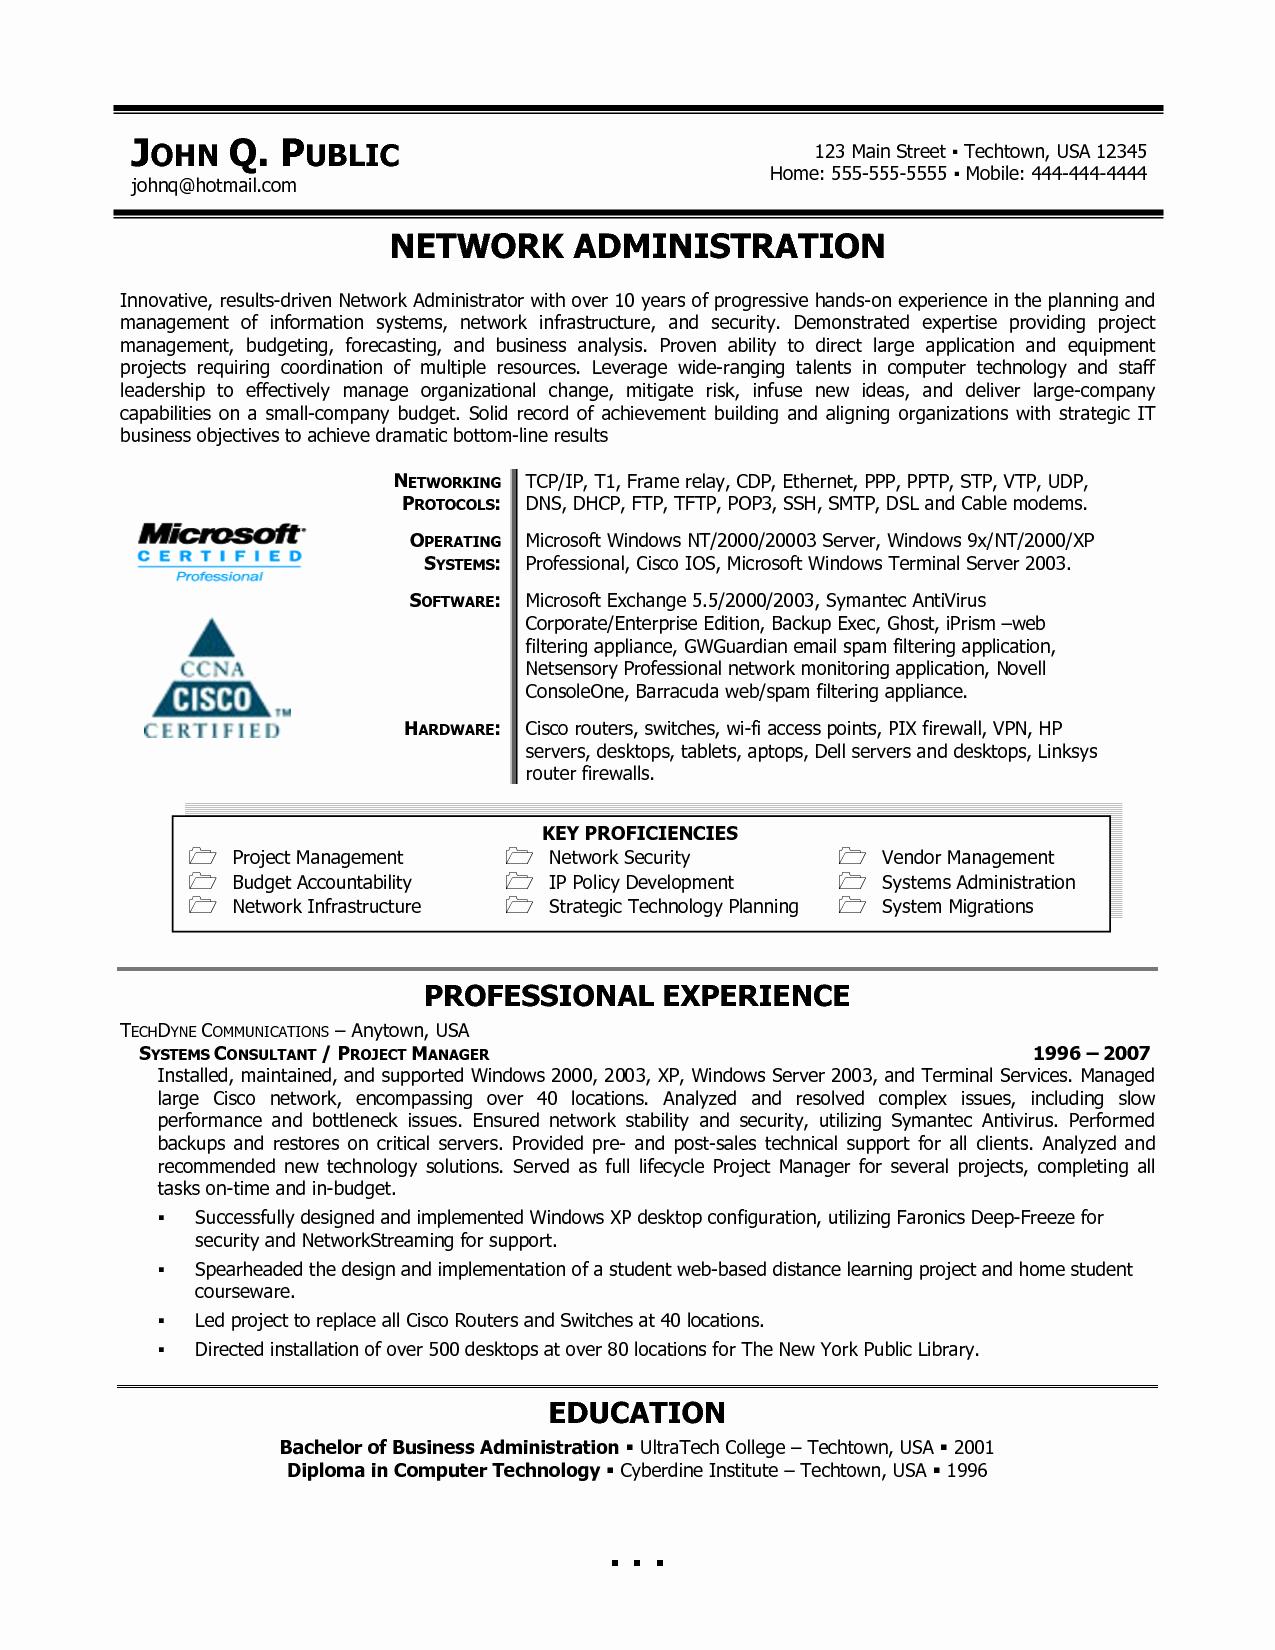 System Administrator Resume Doc 2010 Bongdaao